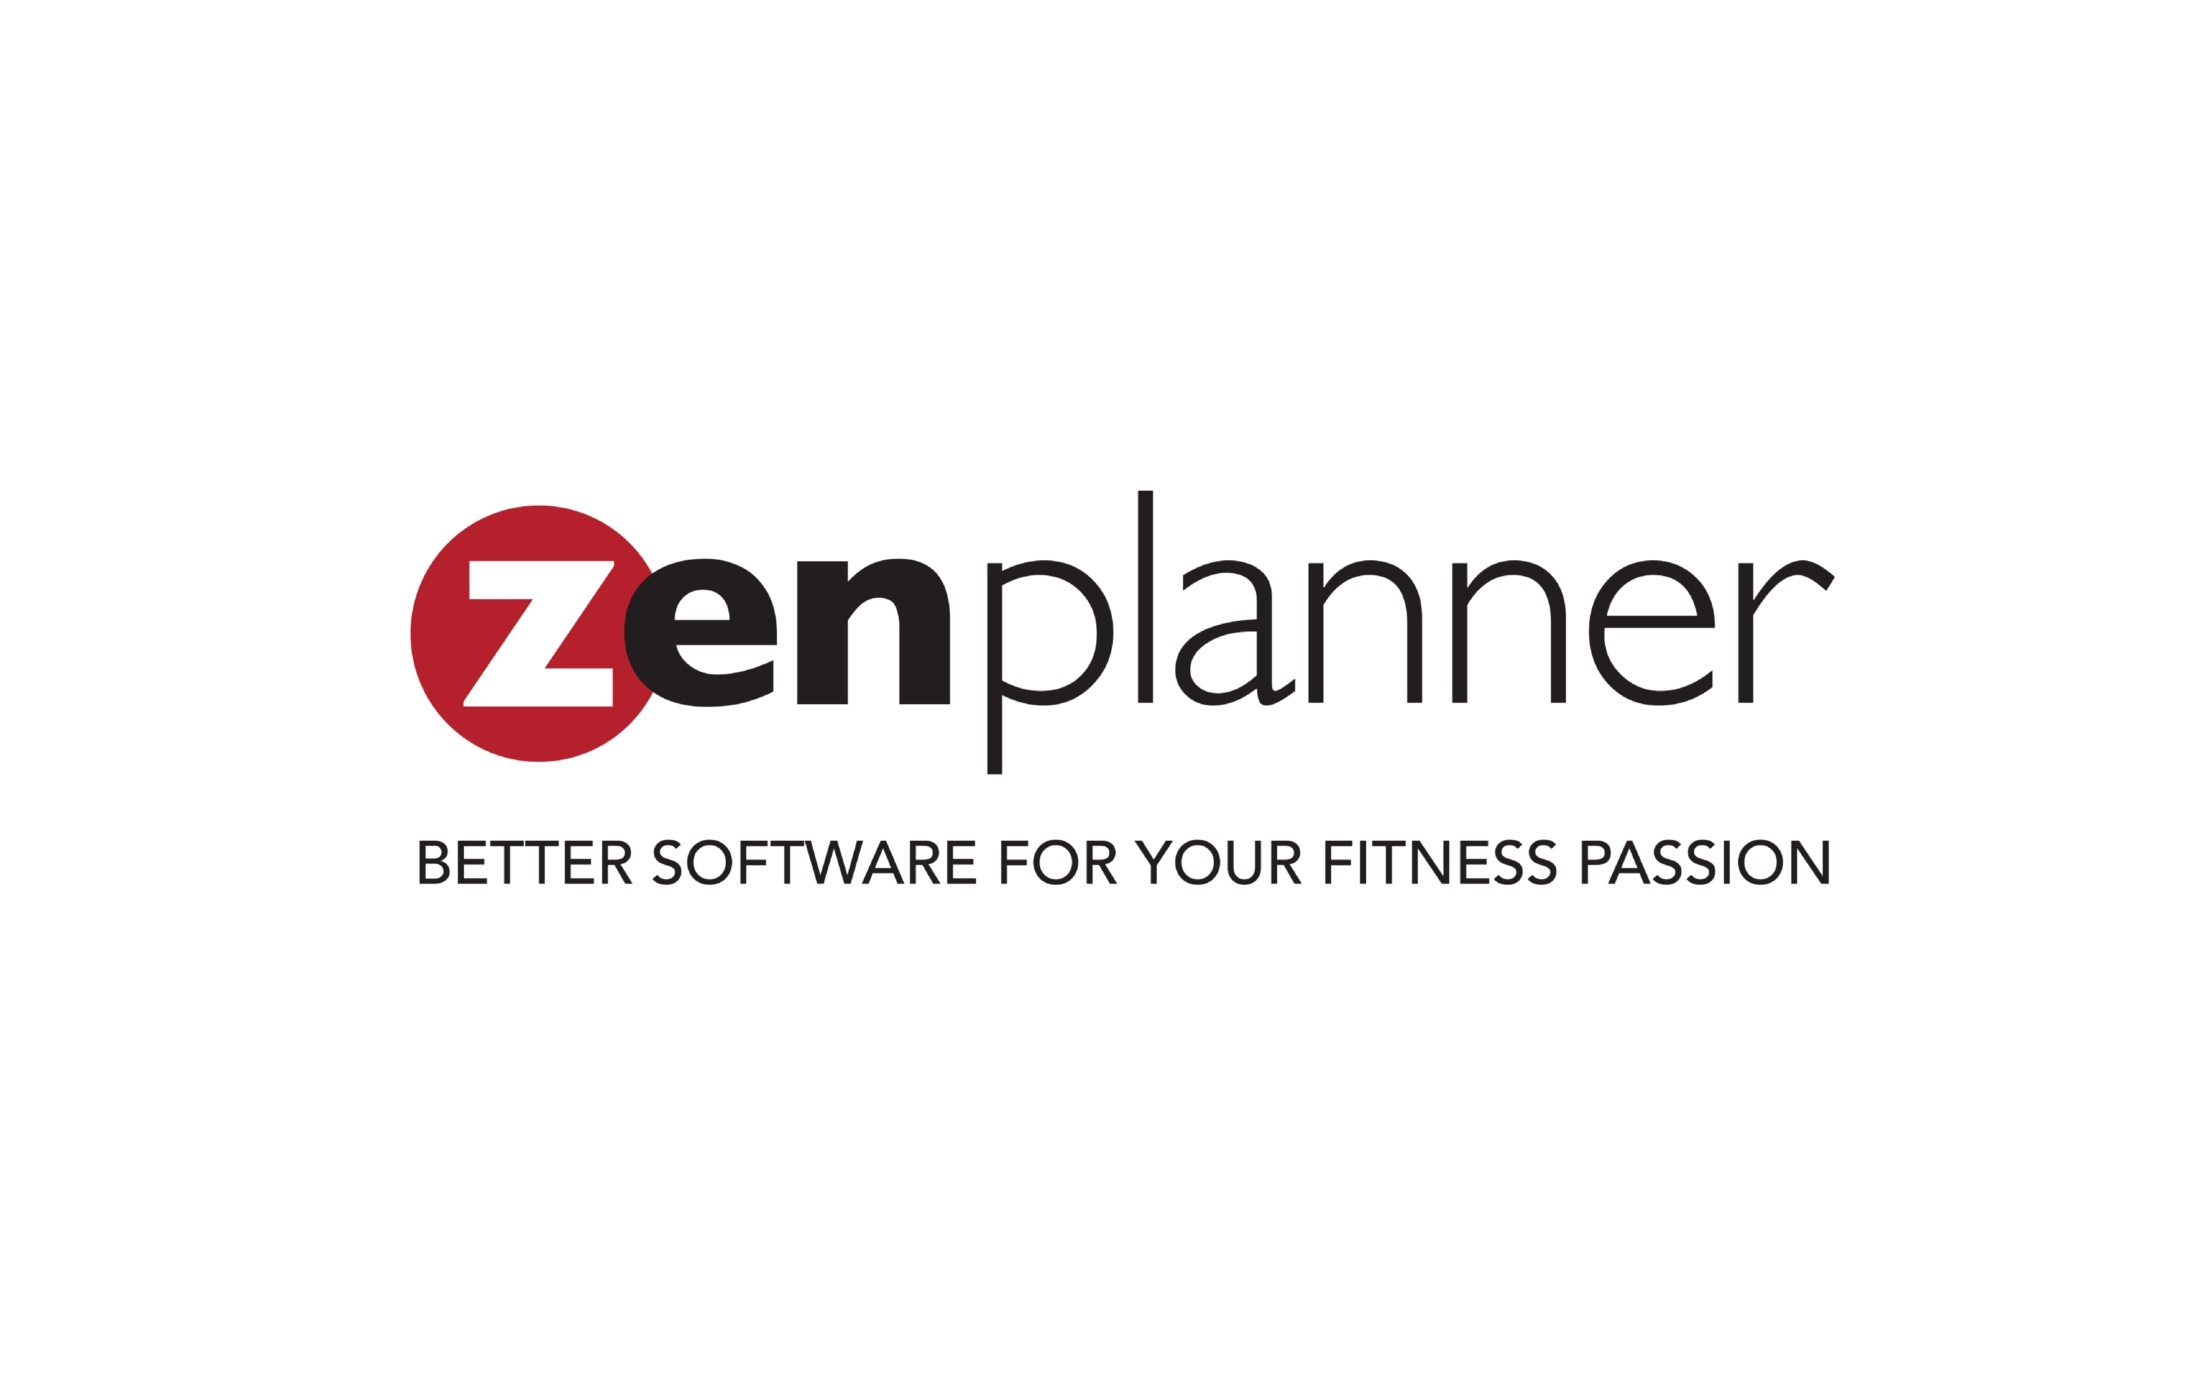 zen%2Bplanner.jpg